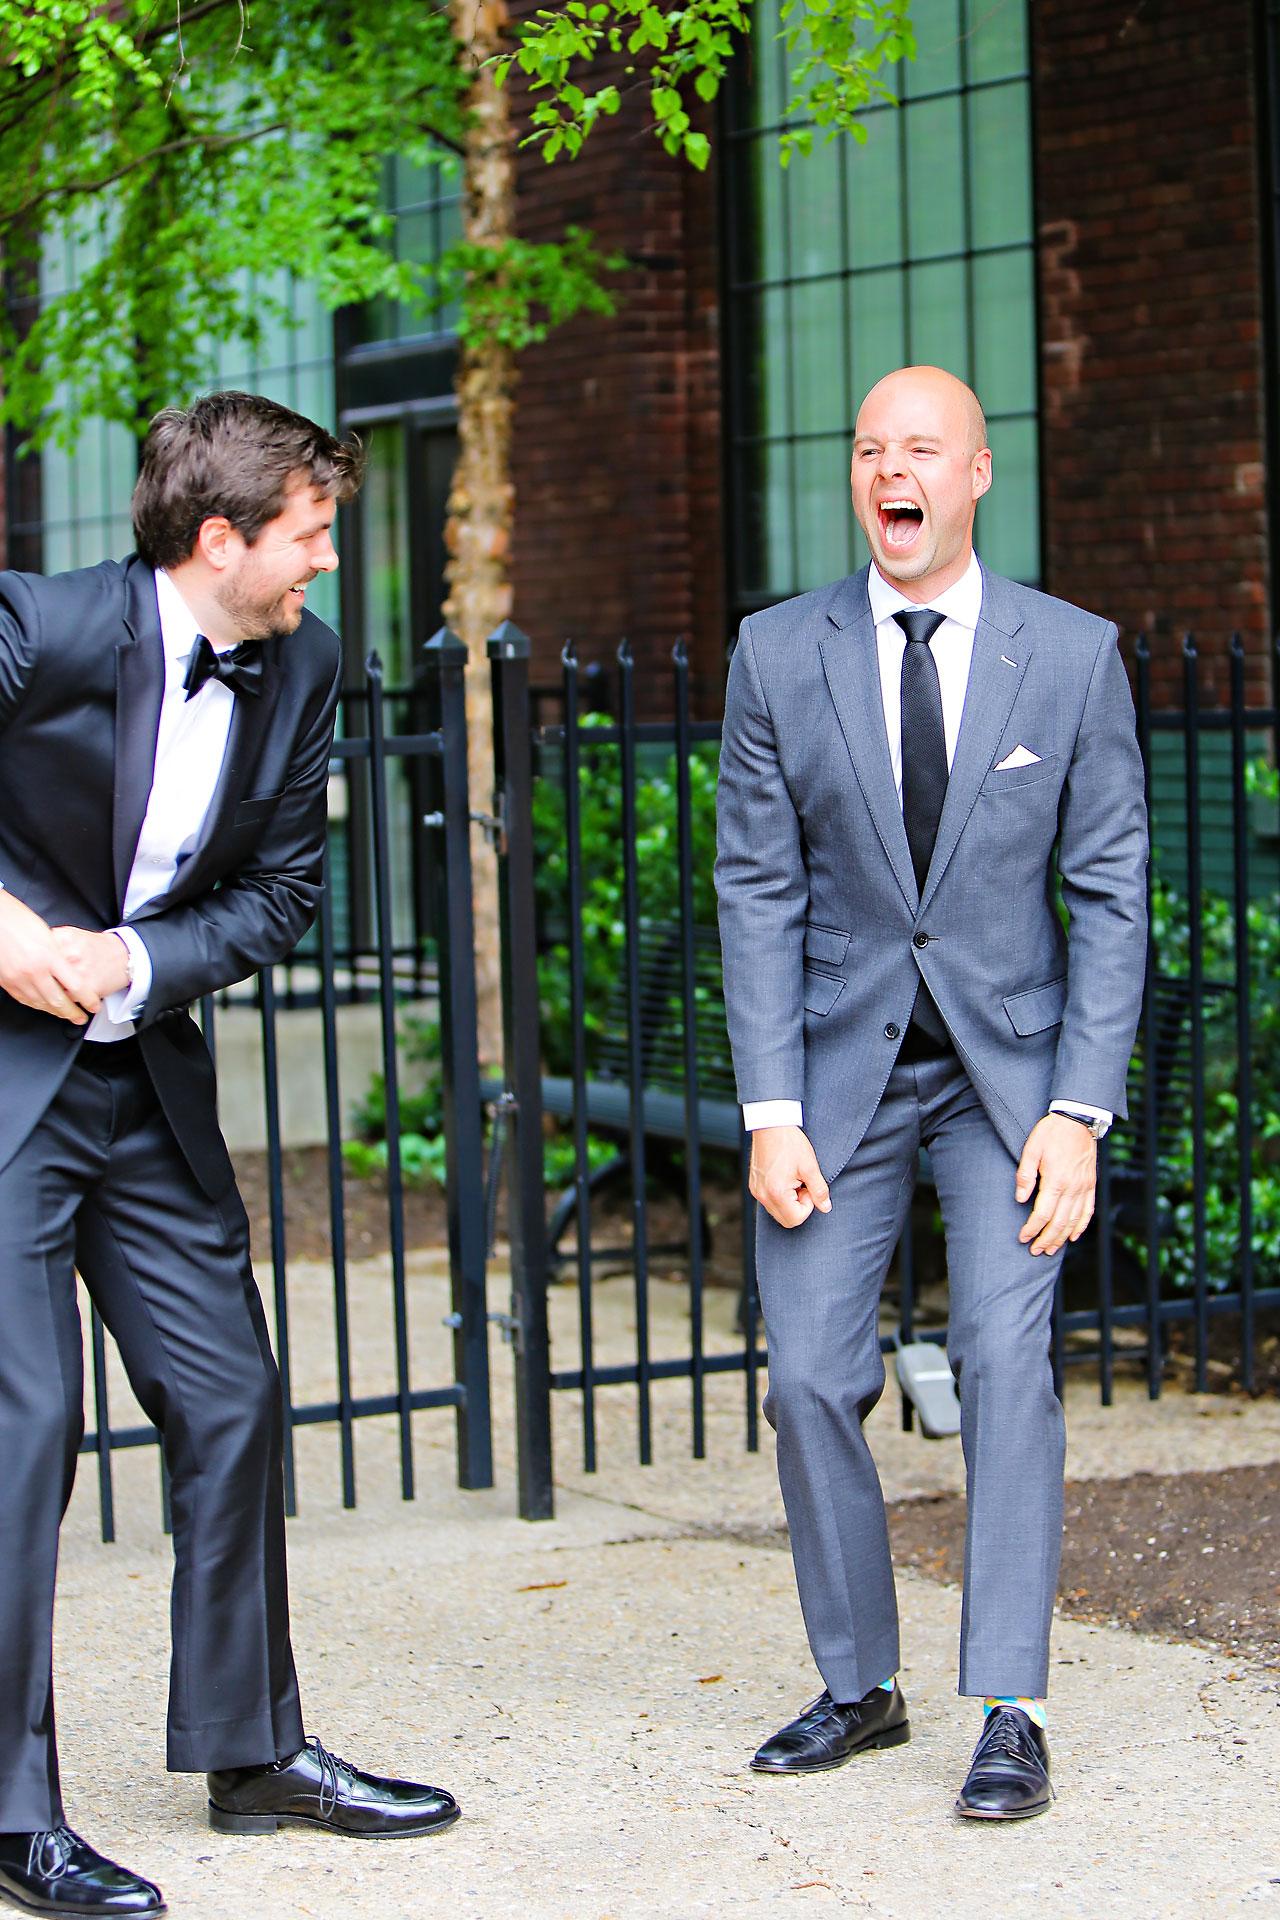 Amy Nick Canal 337 Wedding 108